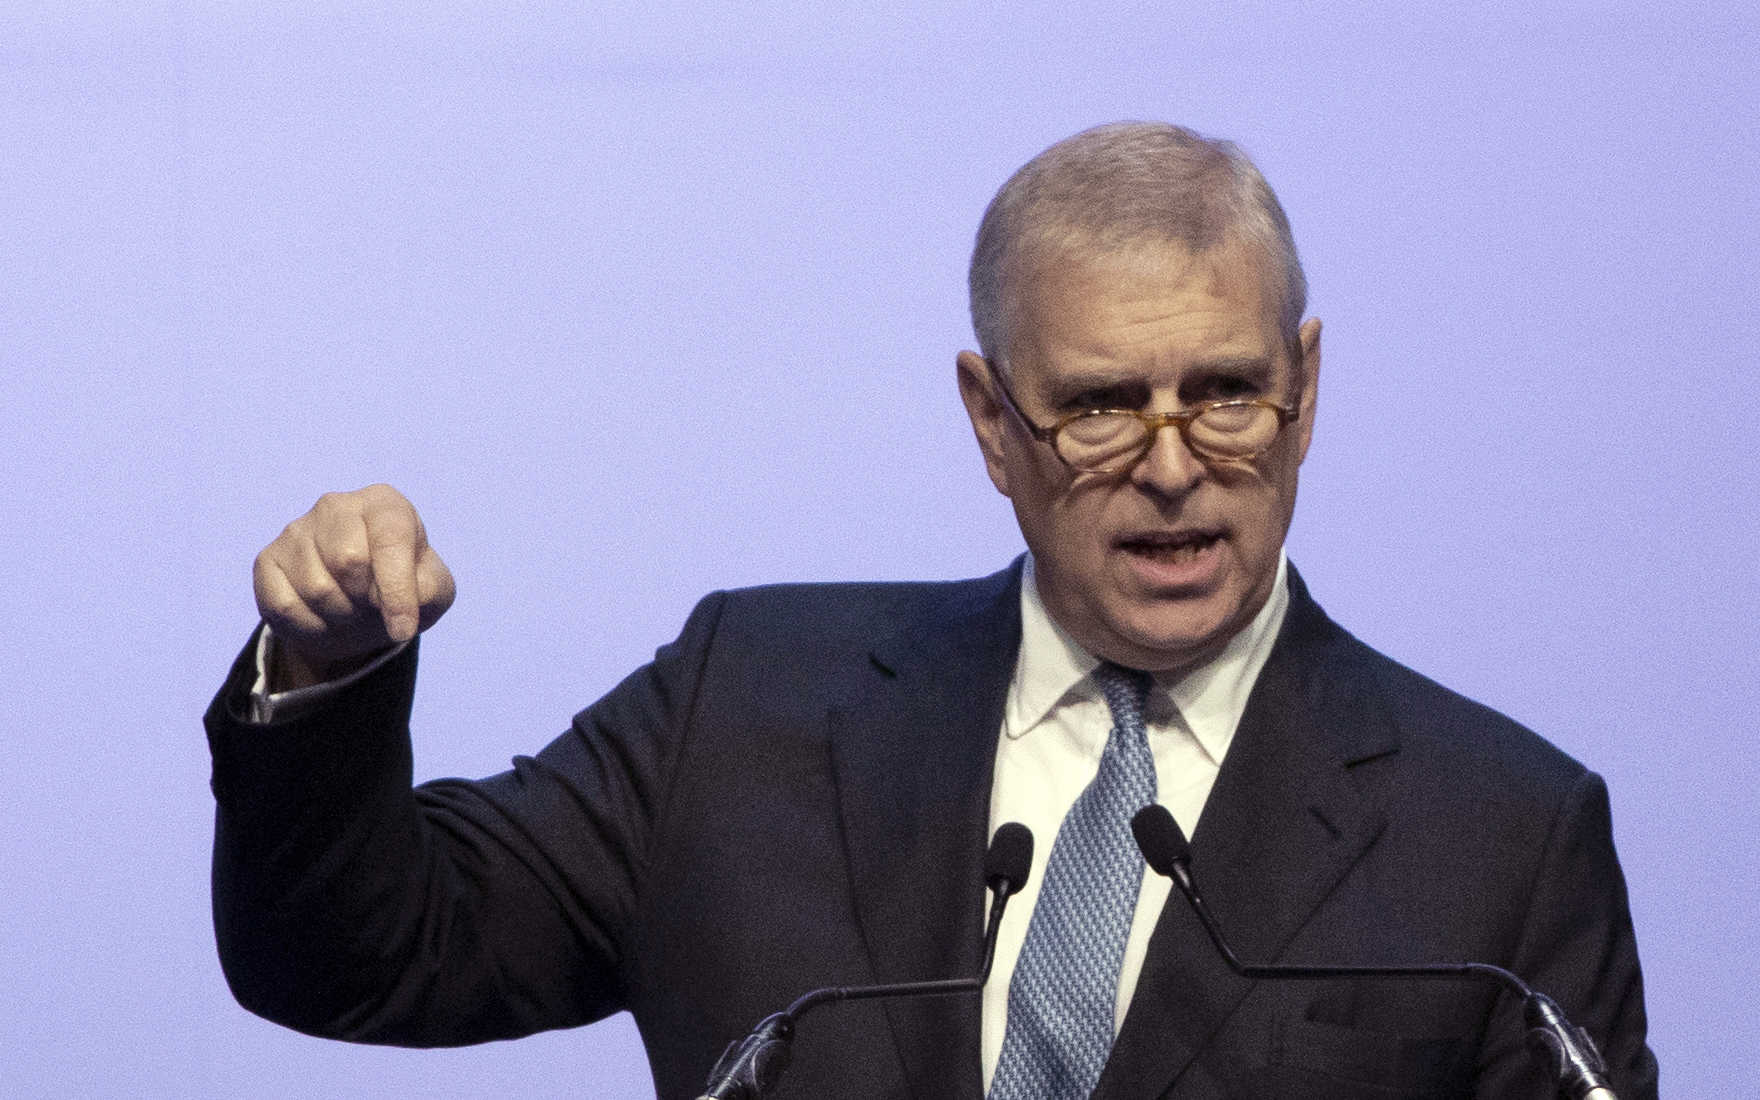 Us Prosecutors Spar With Prince Andrew In Jeffrey Epstein Probe